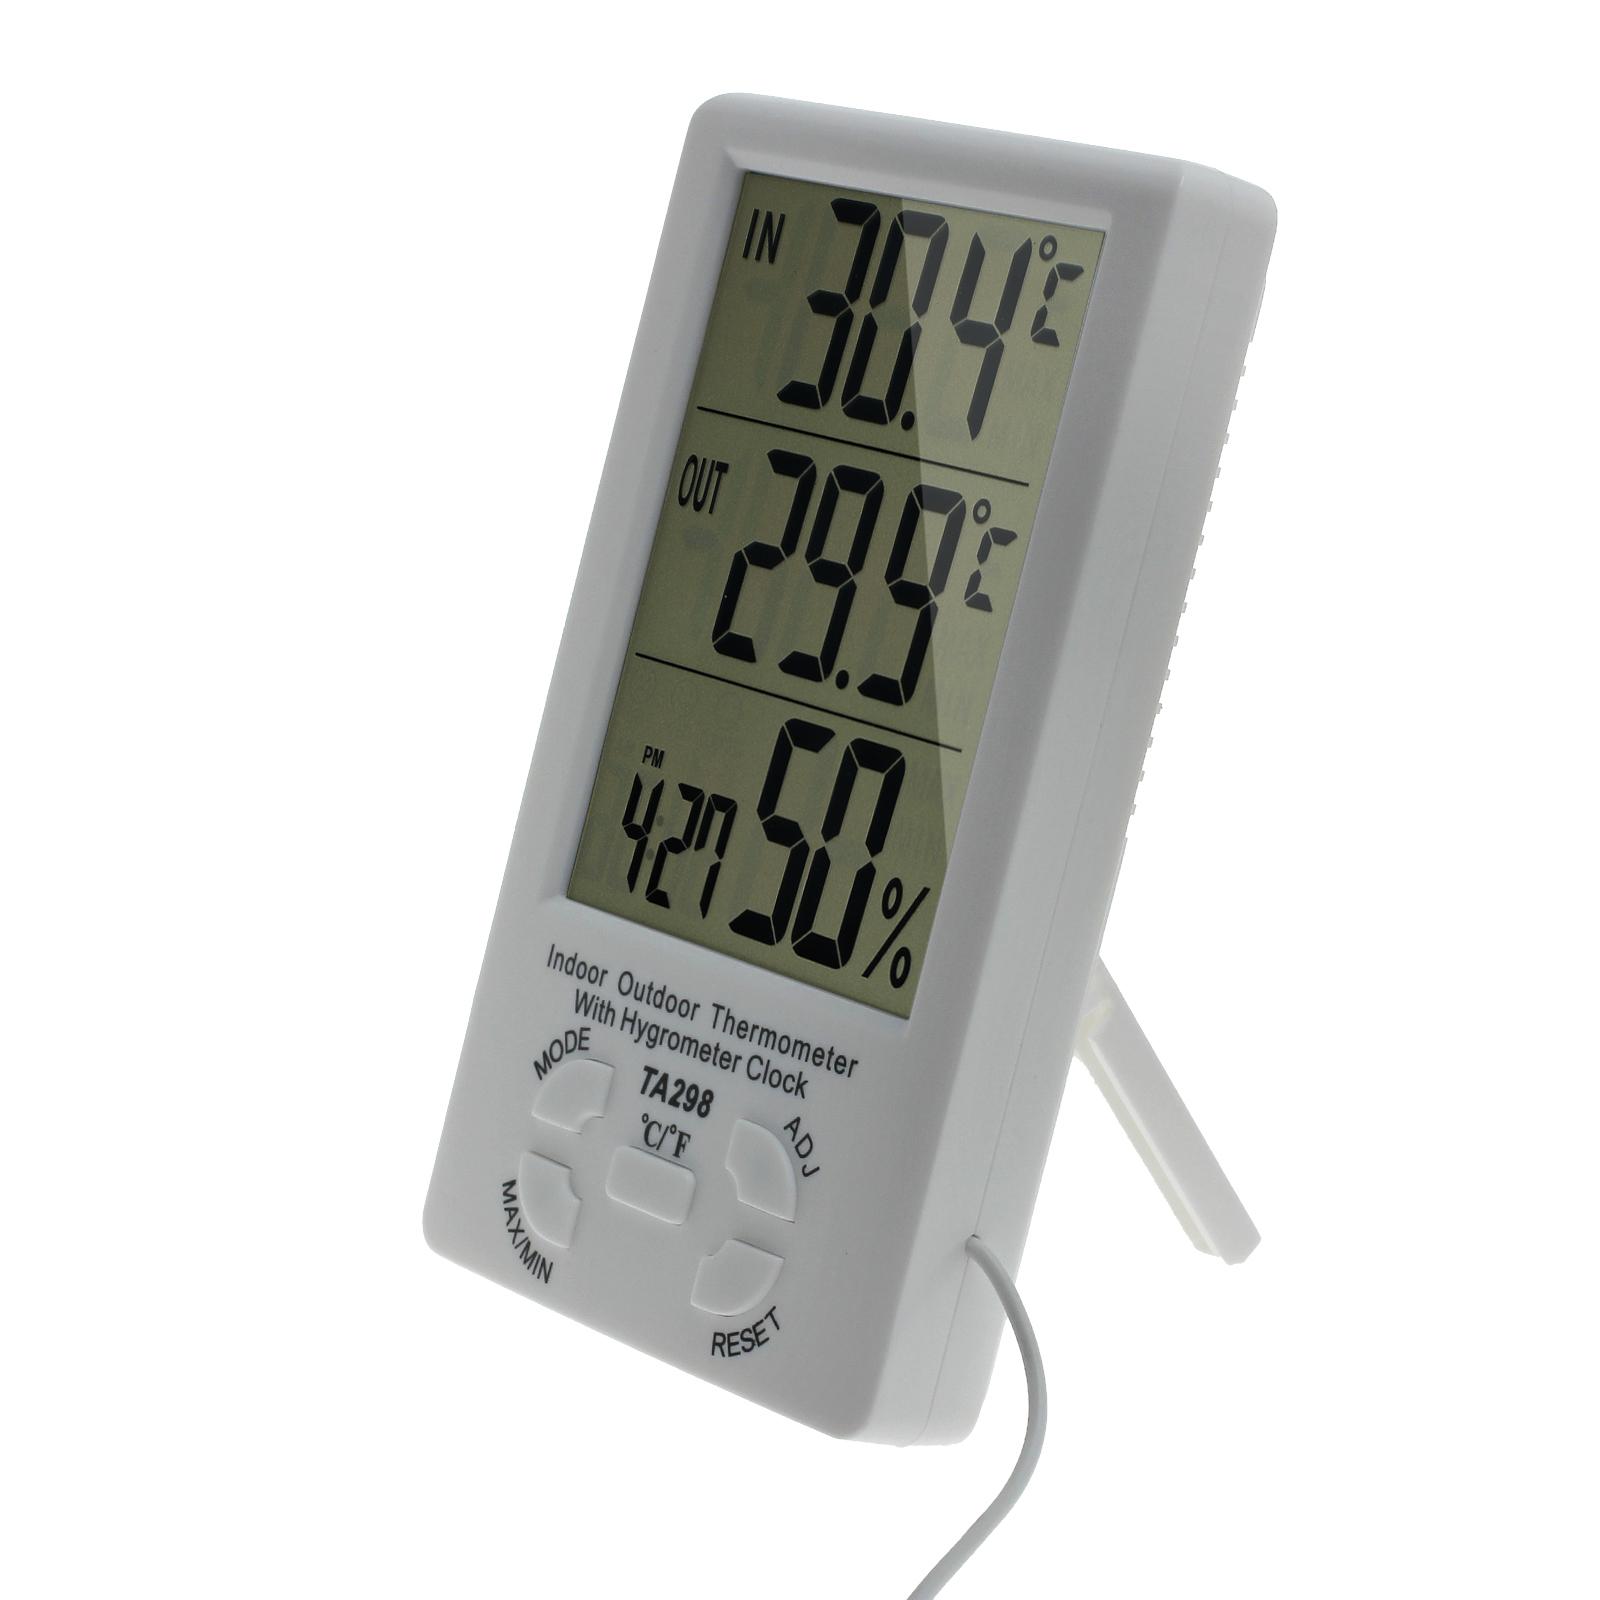 digital innen au en thermometer hygrometer luftfeuchtigkeitsmesser mit sensor ebay. Black Bedroom Furniture Sets. Home Design Ideas